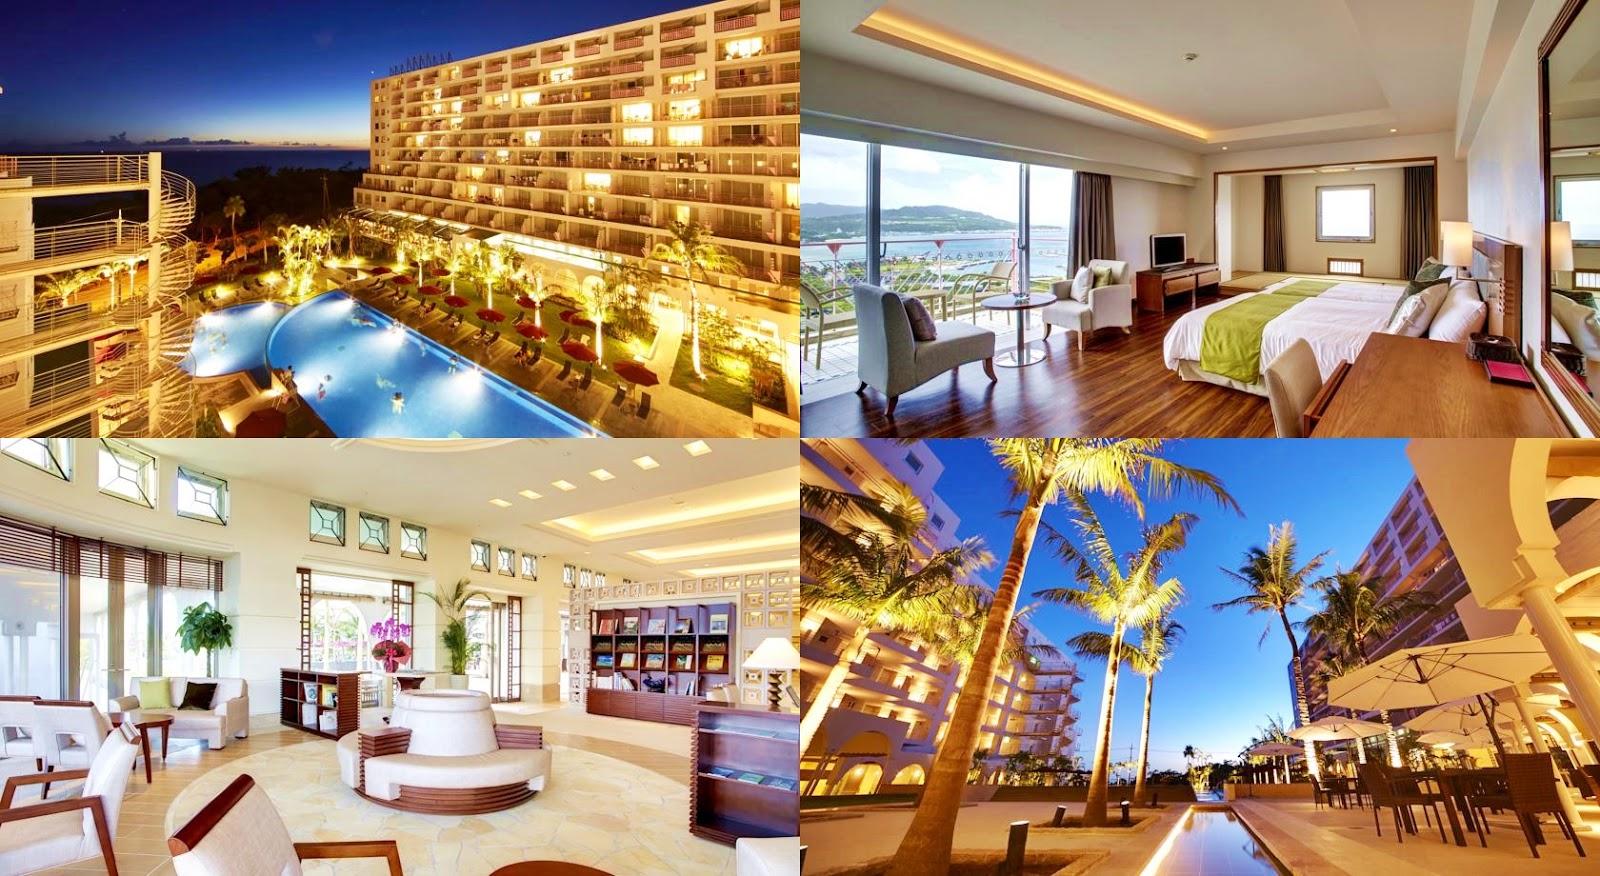 沖繩-住宿-推薦-沖繩馬海納健康度假酒店-Hotel-Mahaina-Wellness-Resorts-Okinawa-hotel-recommendation